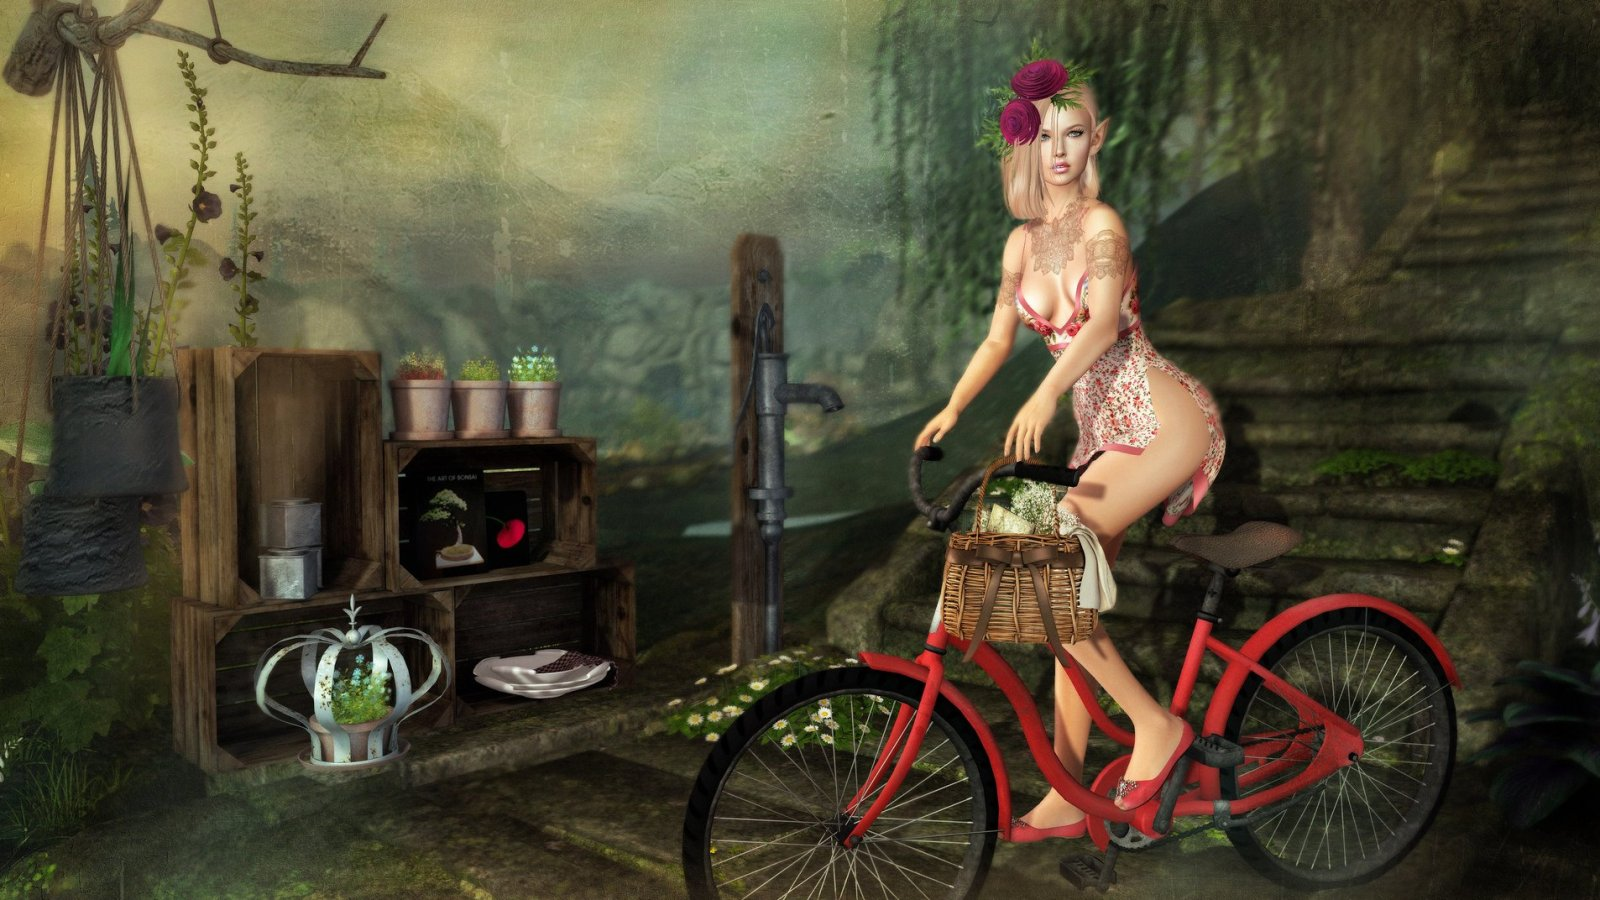 Gizz babydoll and bike